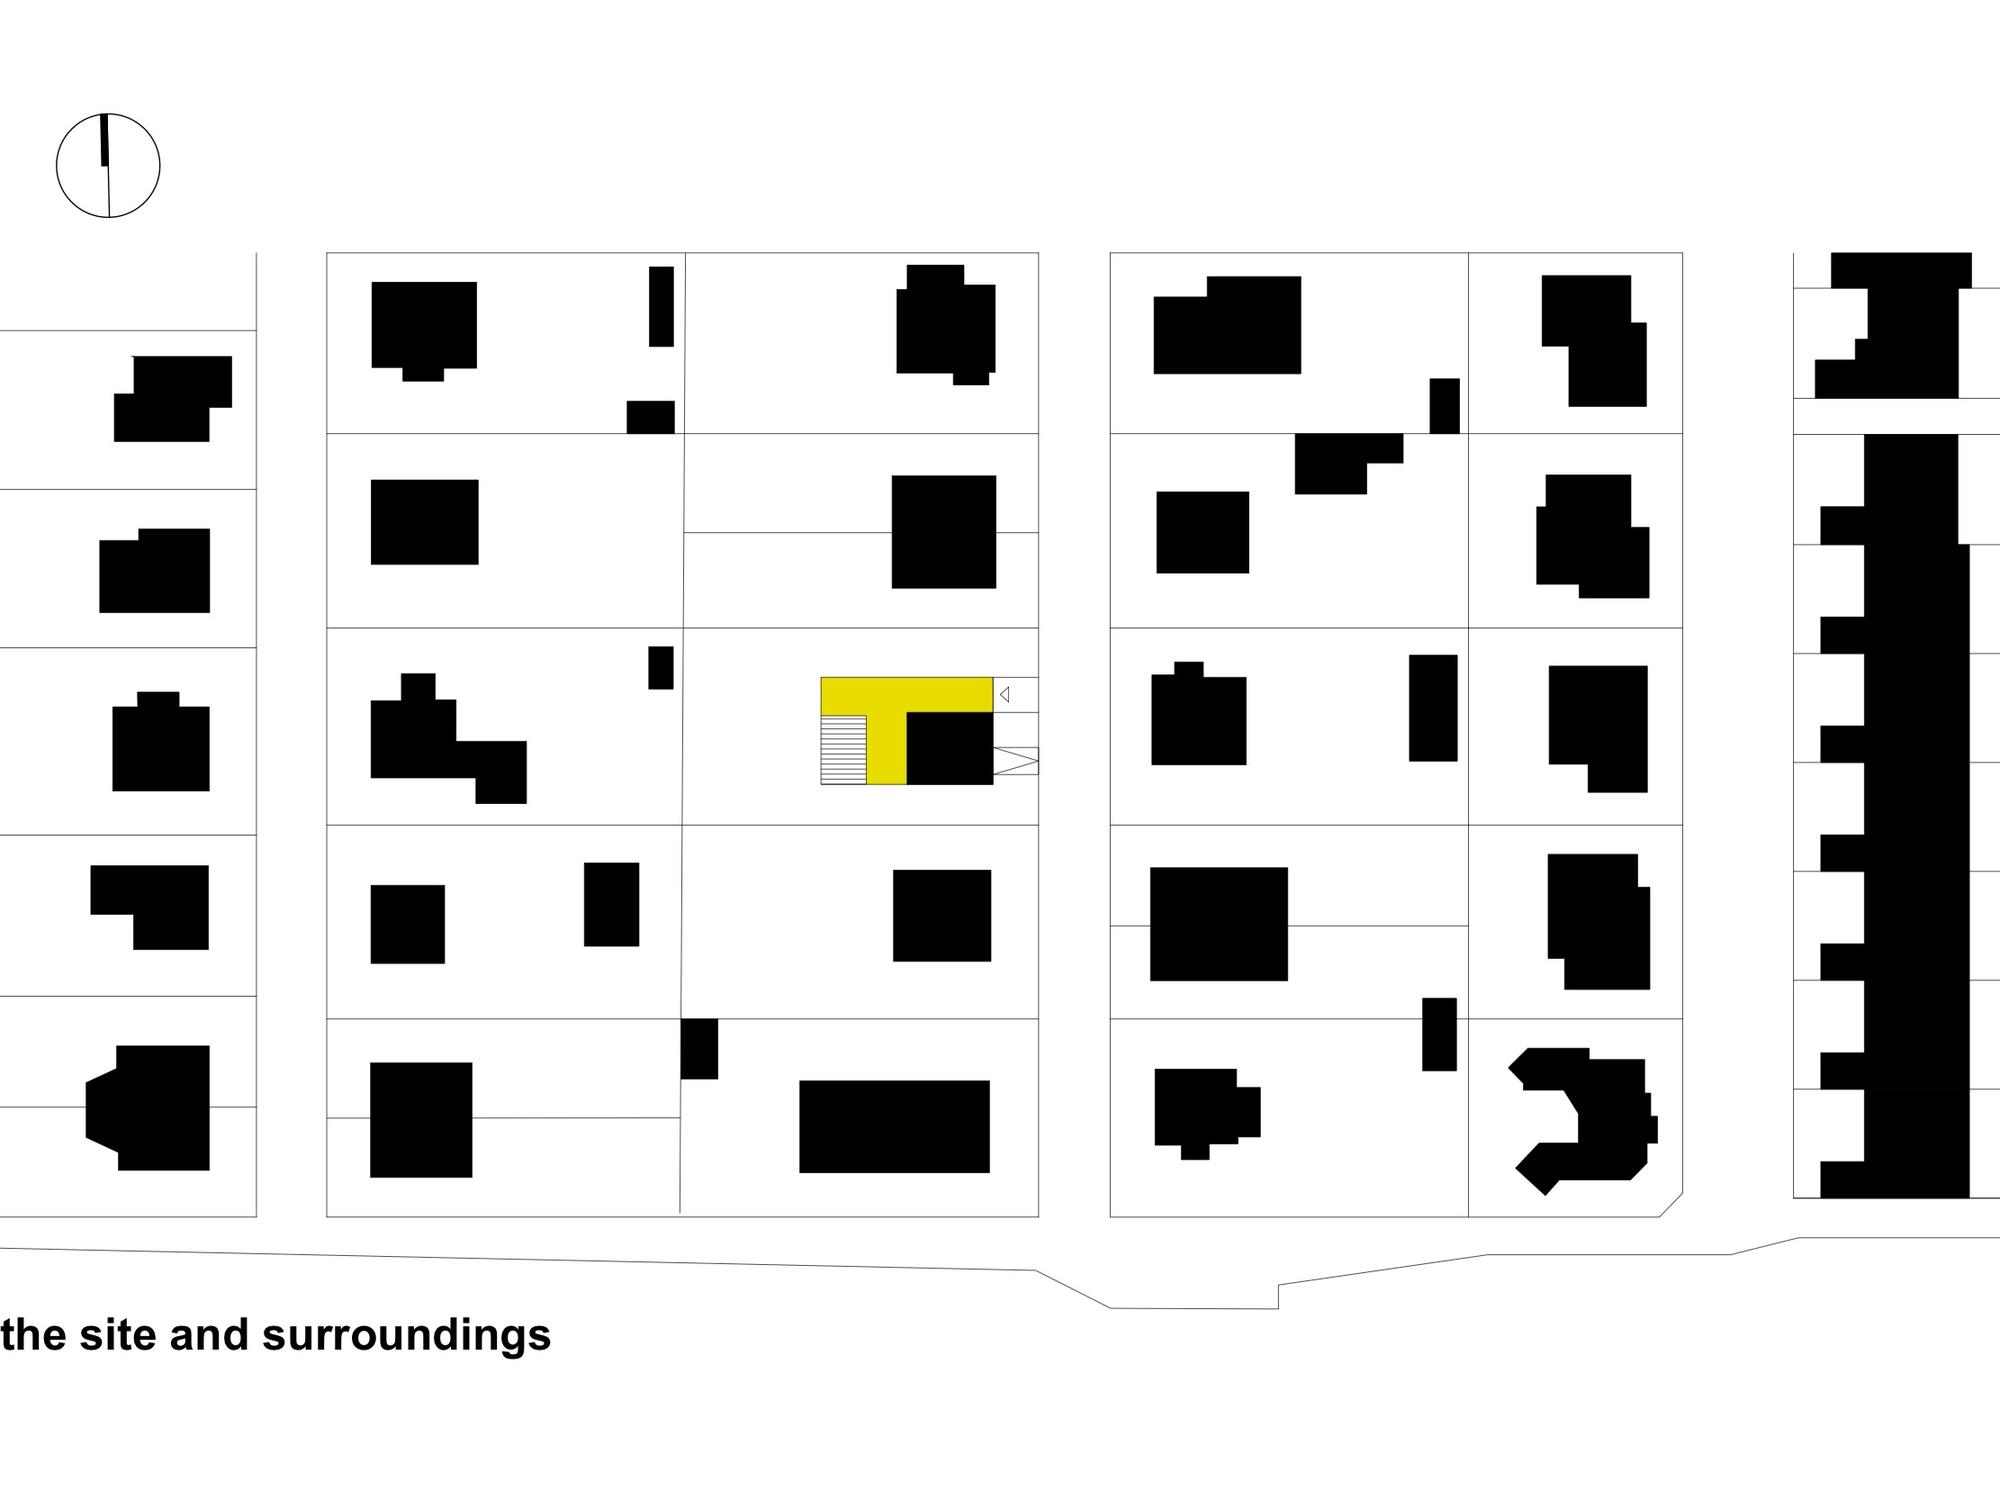 black-cube-house-kameleonlab_bc_siteplan_02_copy